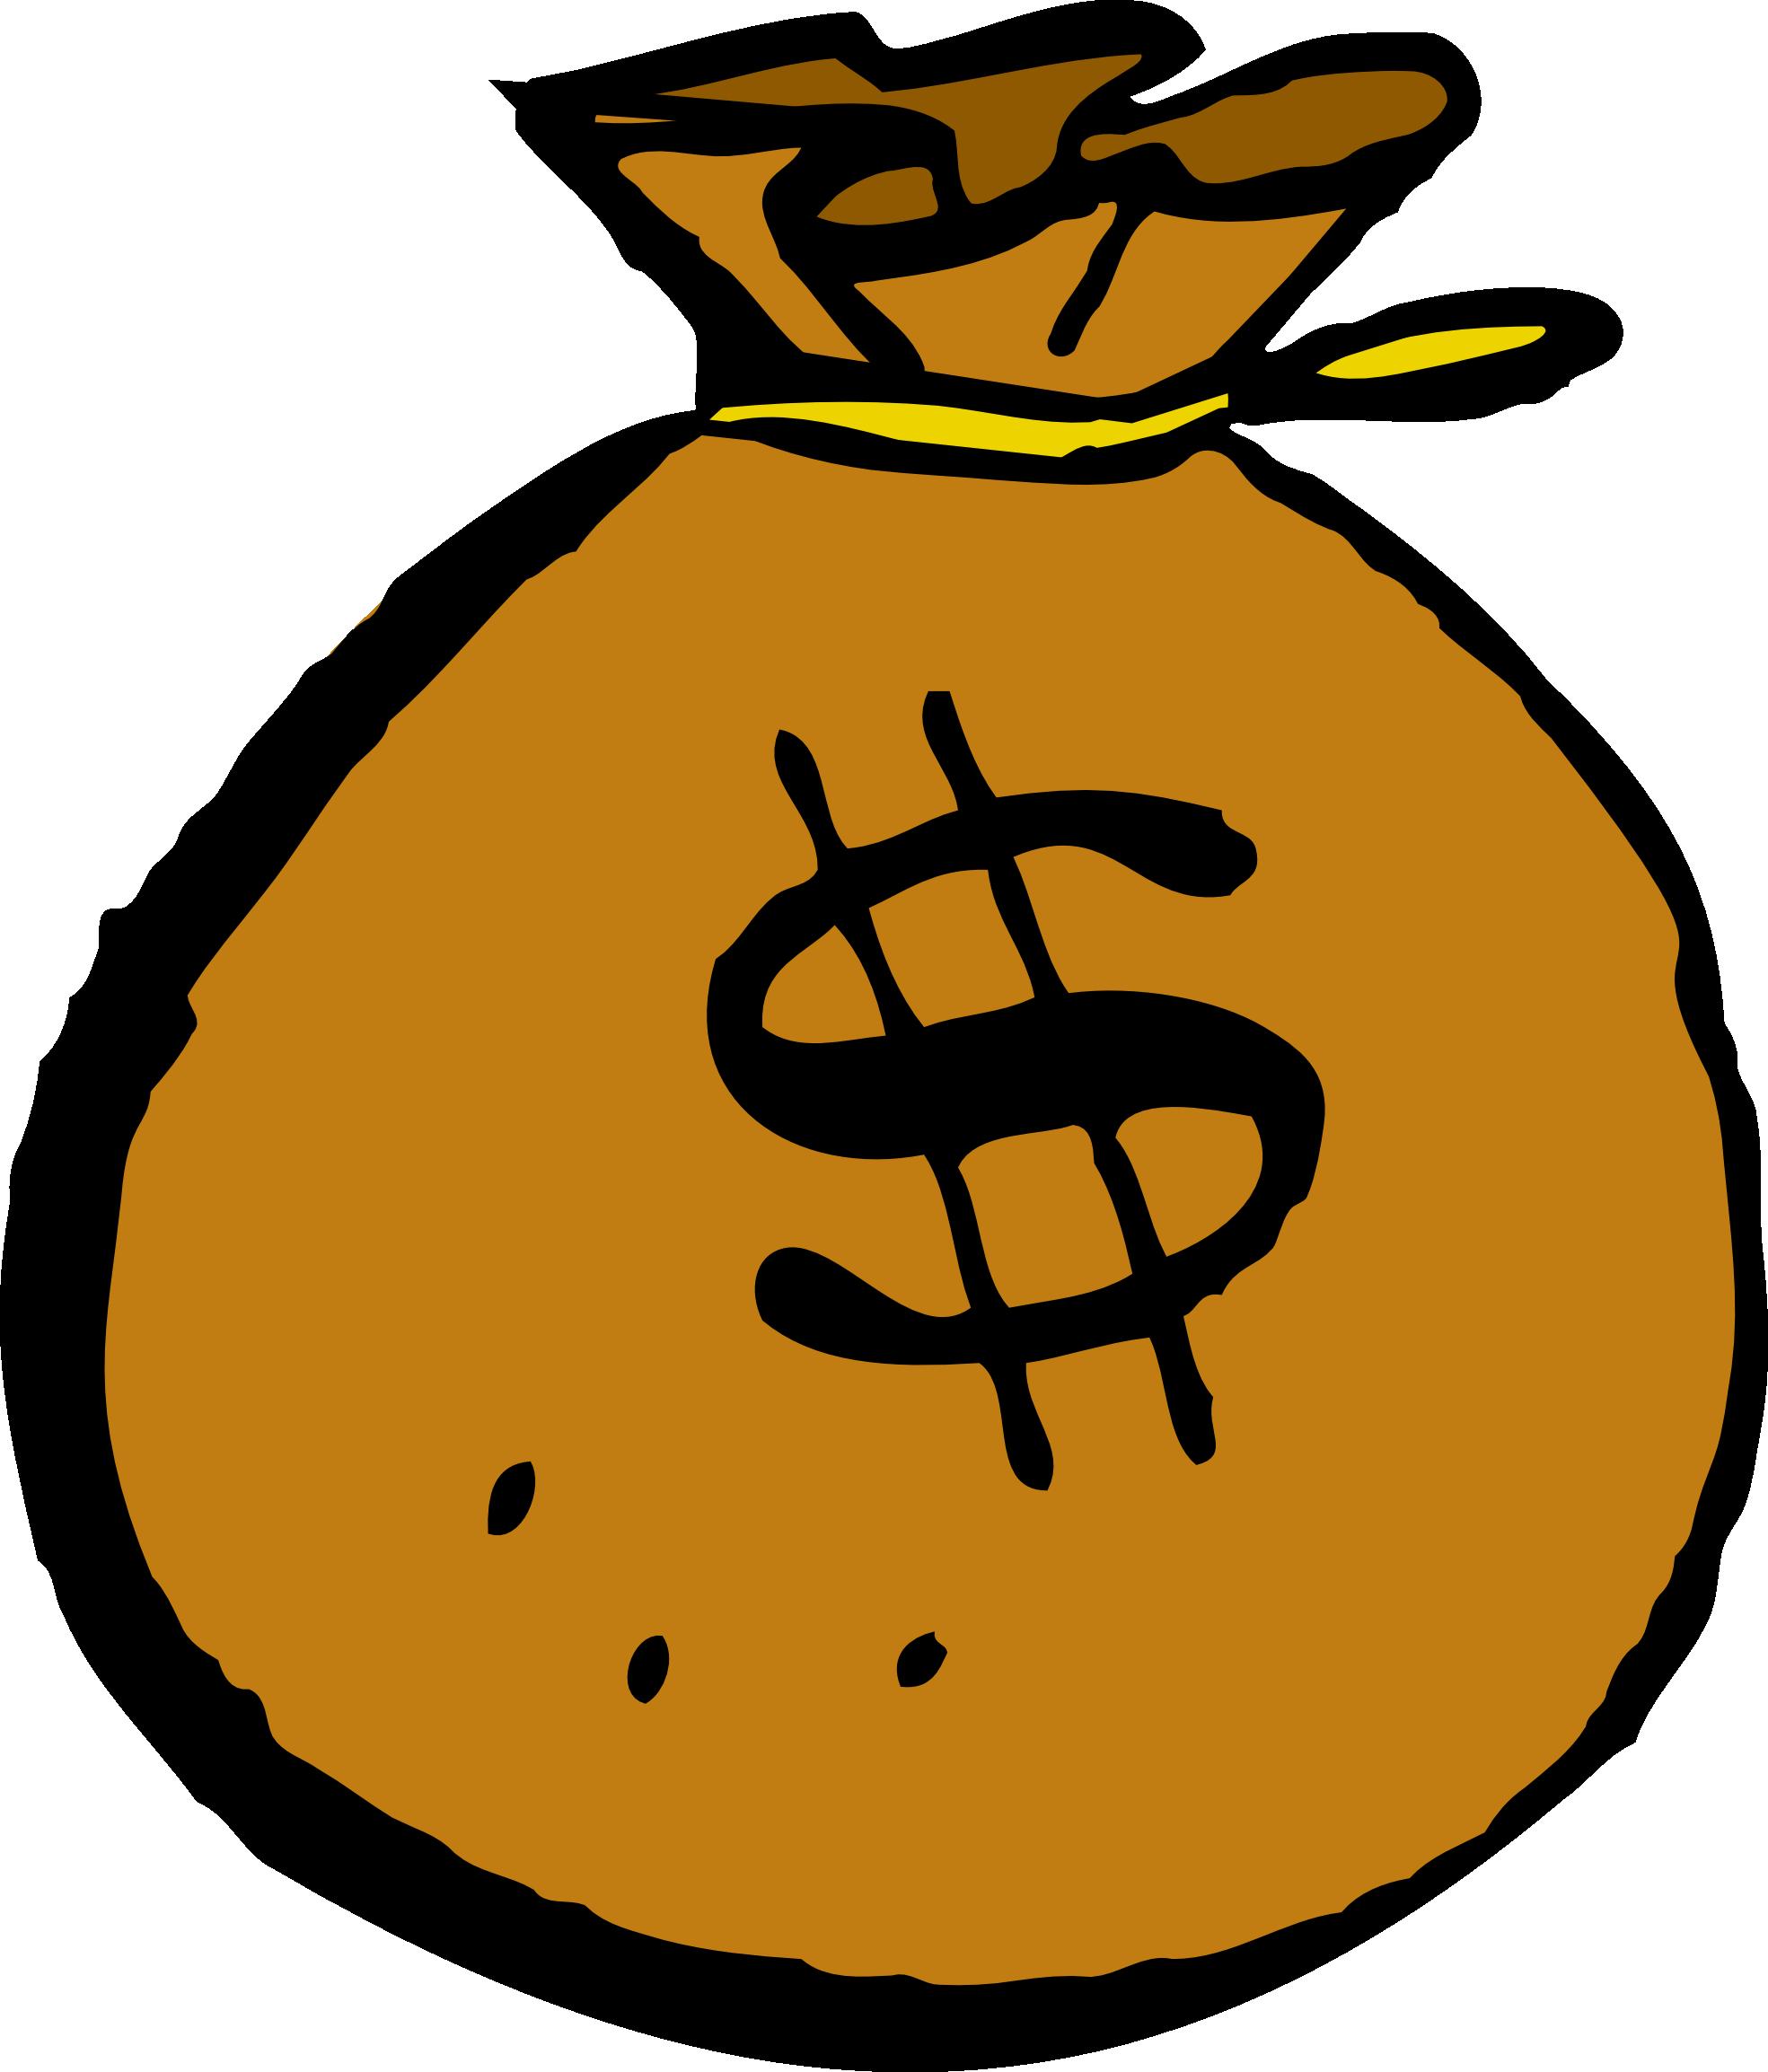 Swag clipart bag money Money%20bag%20clipart Images Bag Clipart Clipart